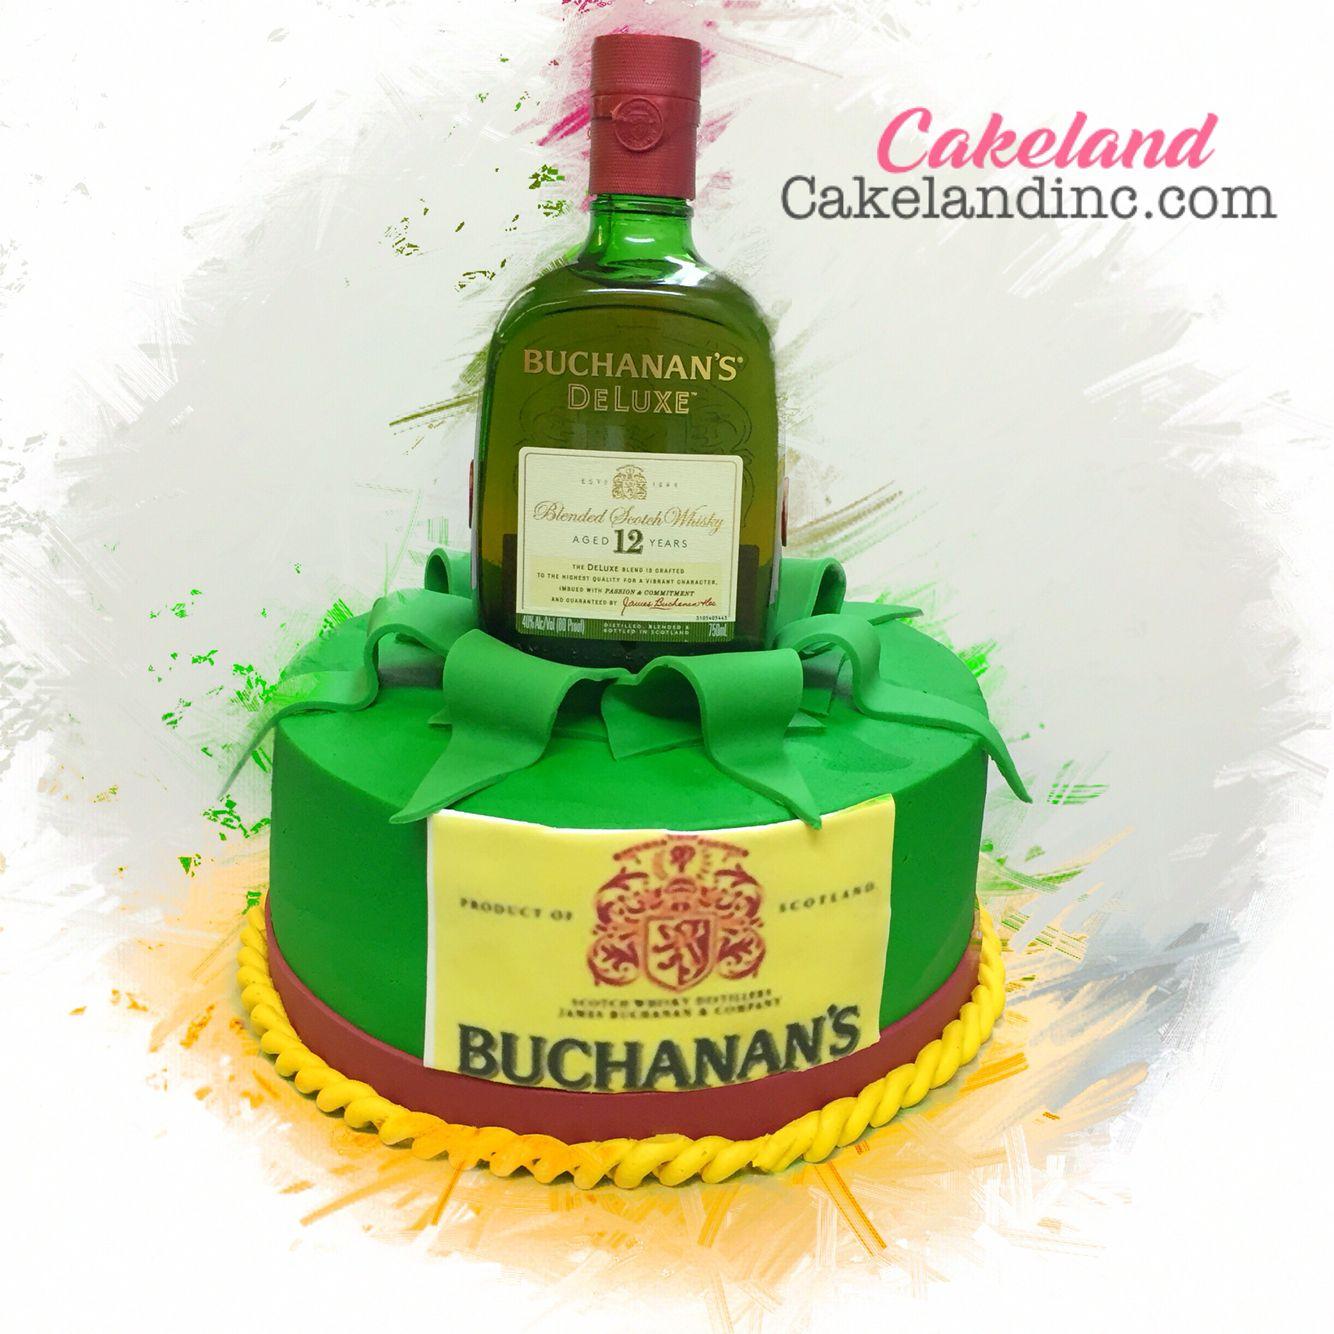 12buchanan Cake Grooms Cake In 2019 21st Birthday Cakes